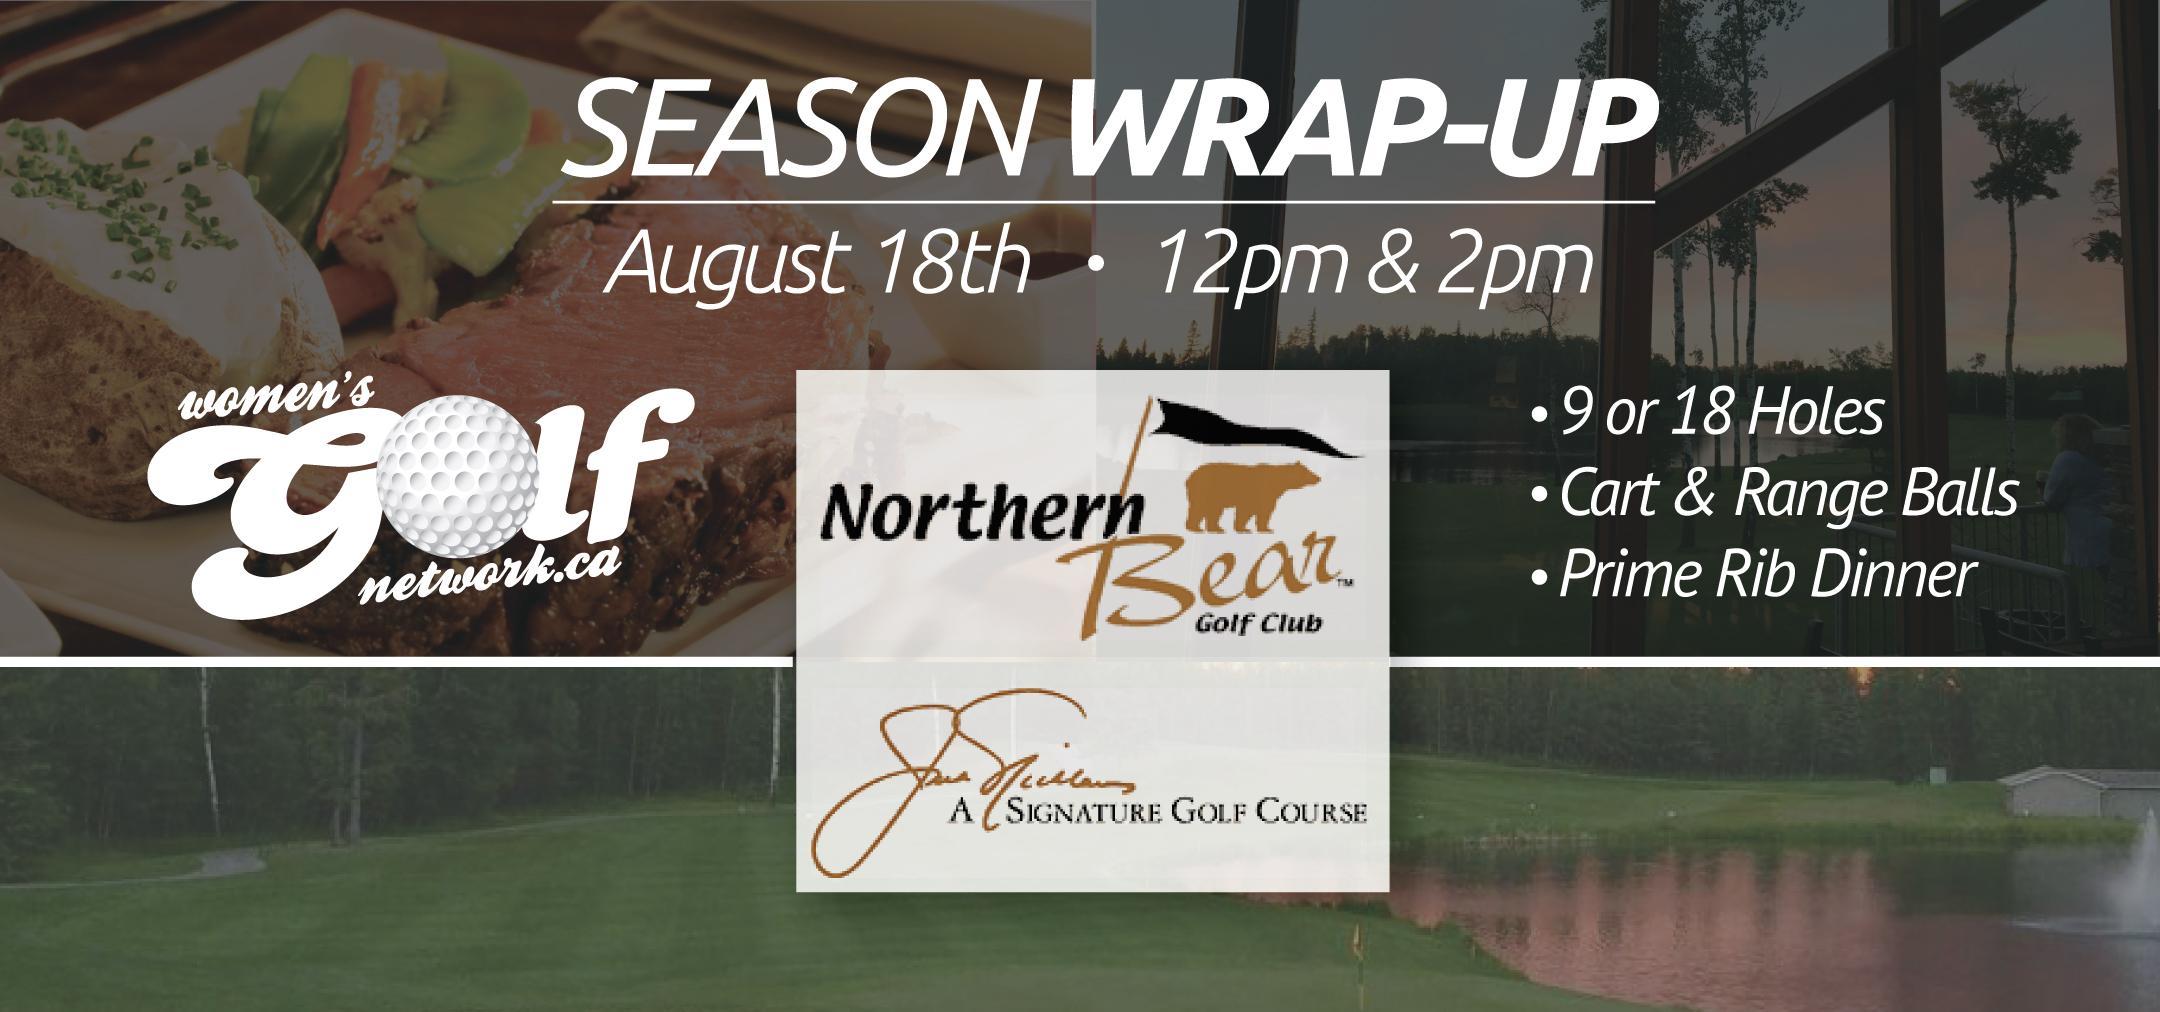 Northern Bear Season Wrap-Up - Edmonton Women's Golf